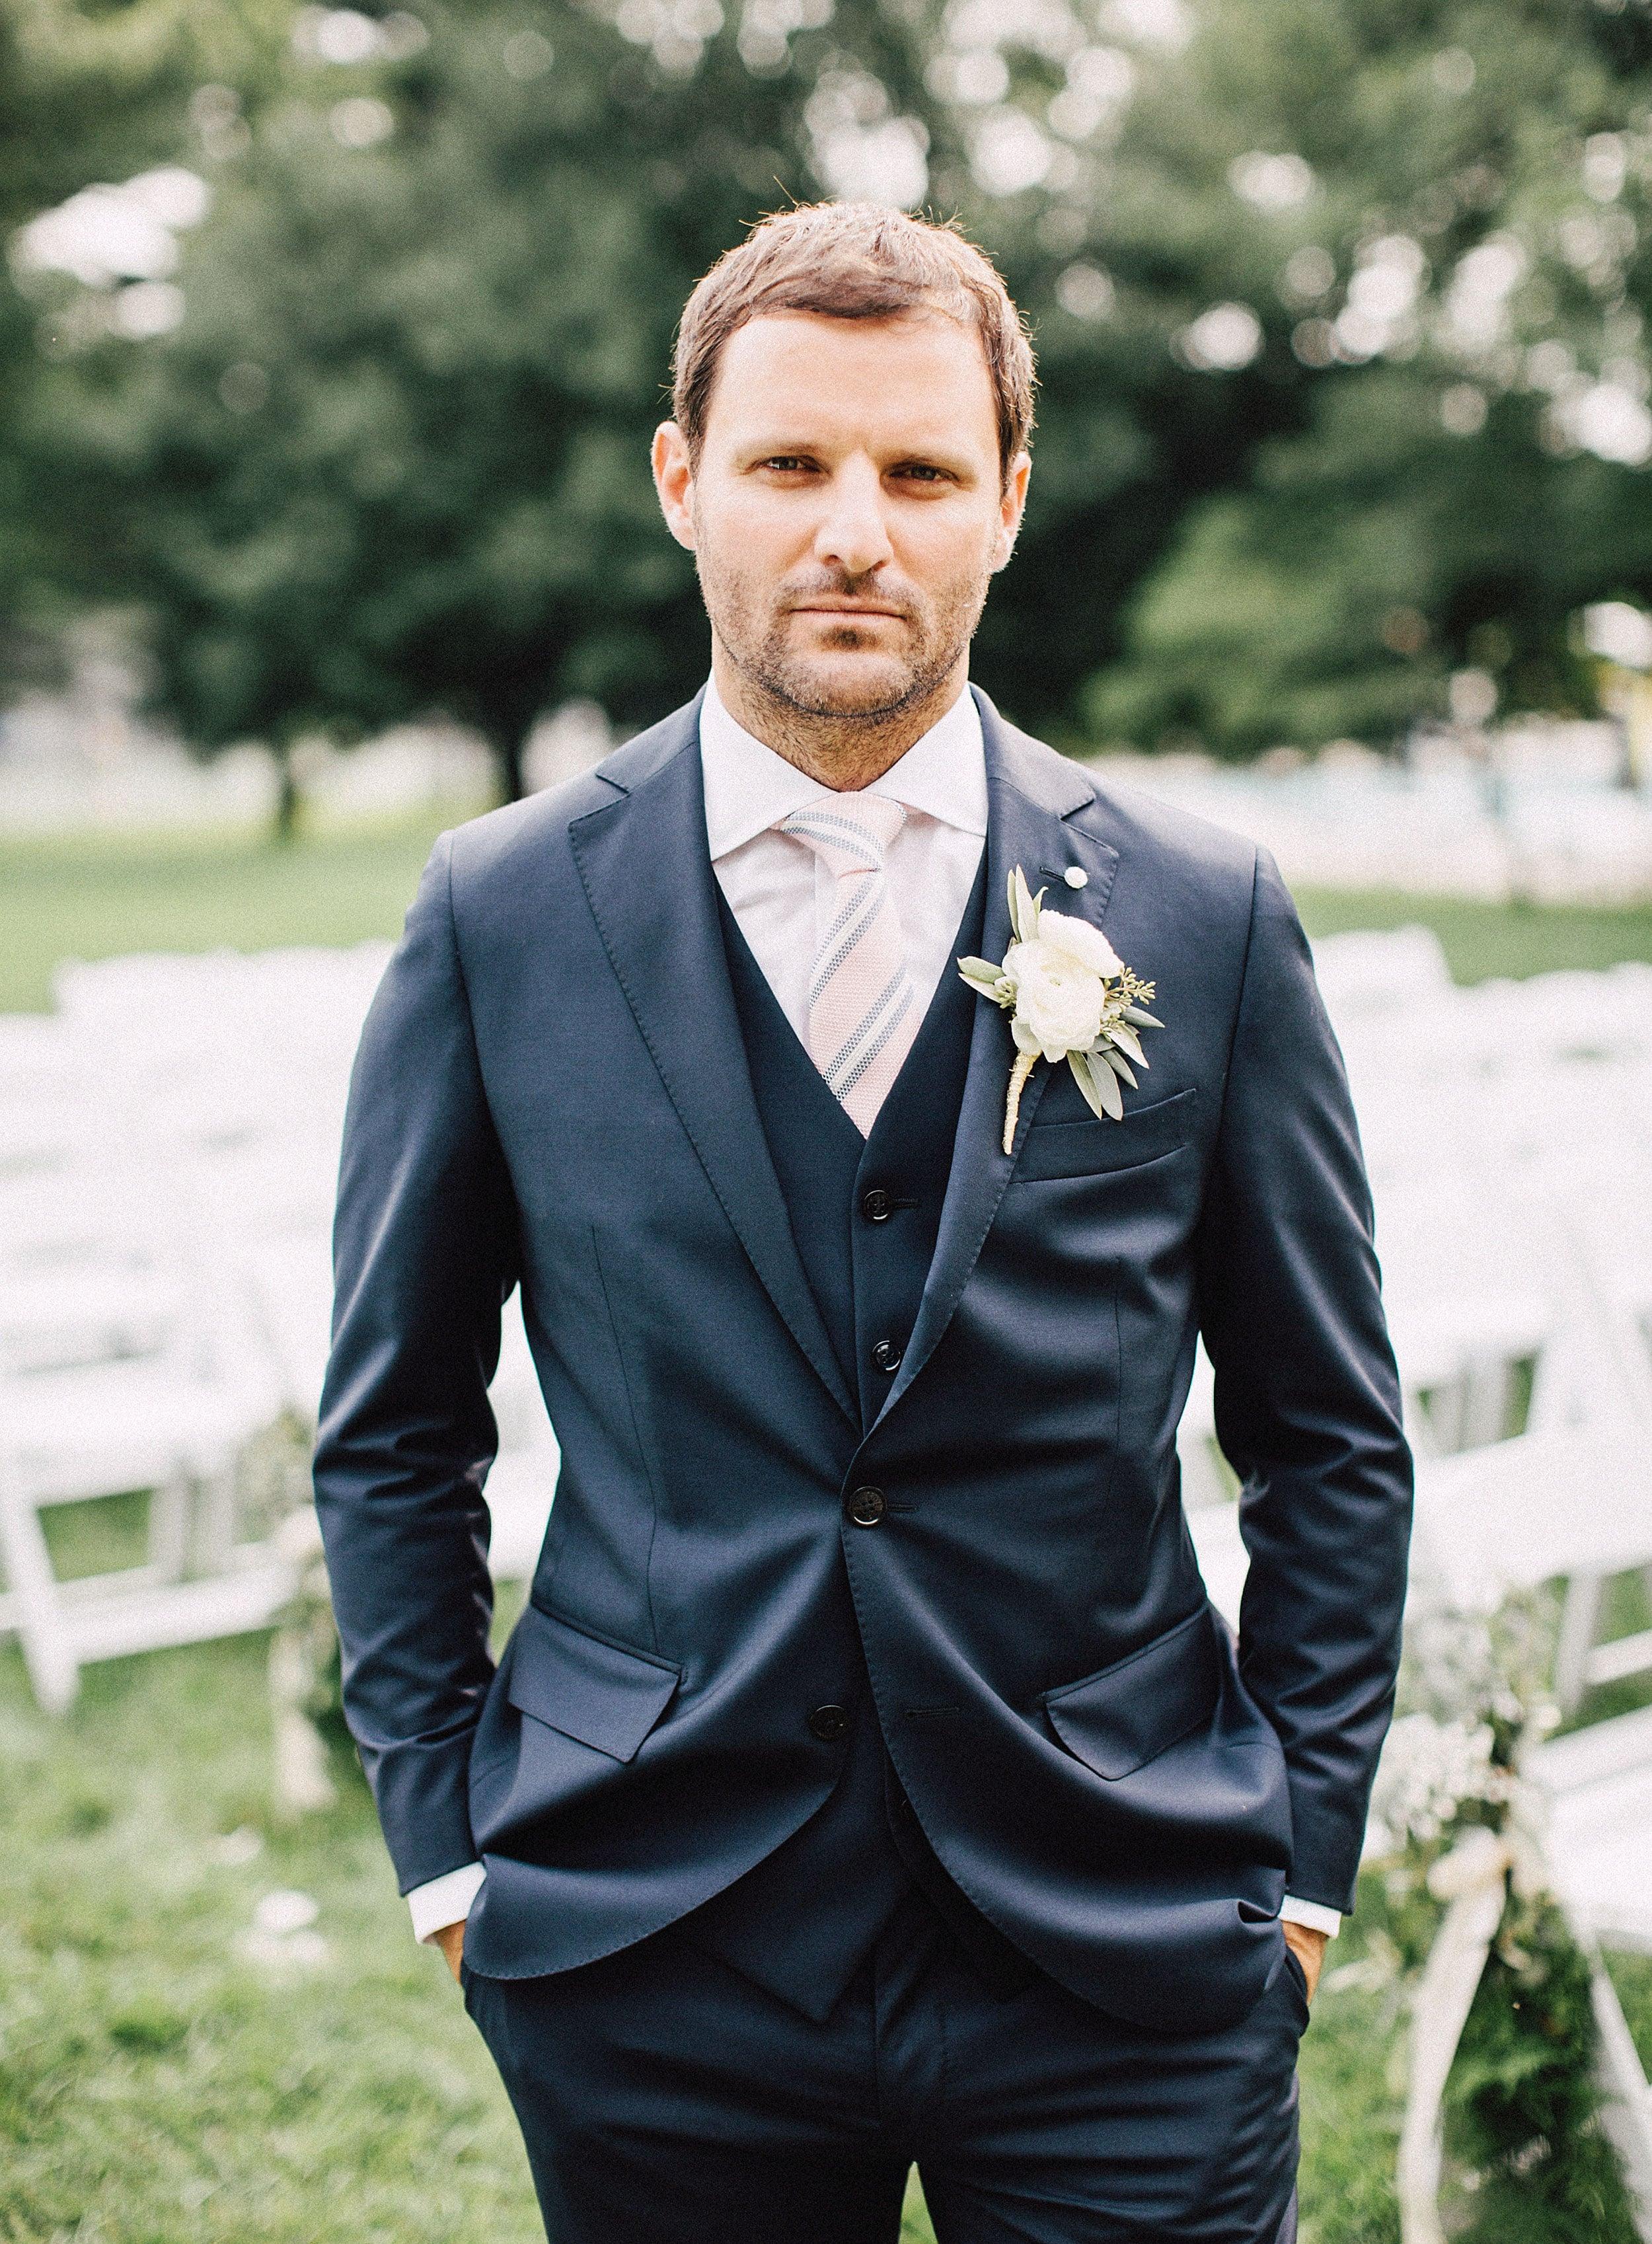 spindletop-lexington-wedding-photographer-017.JPG